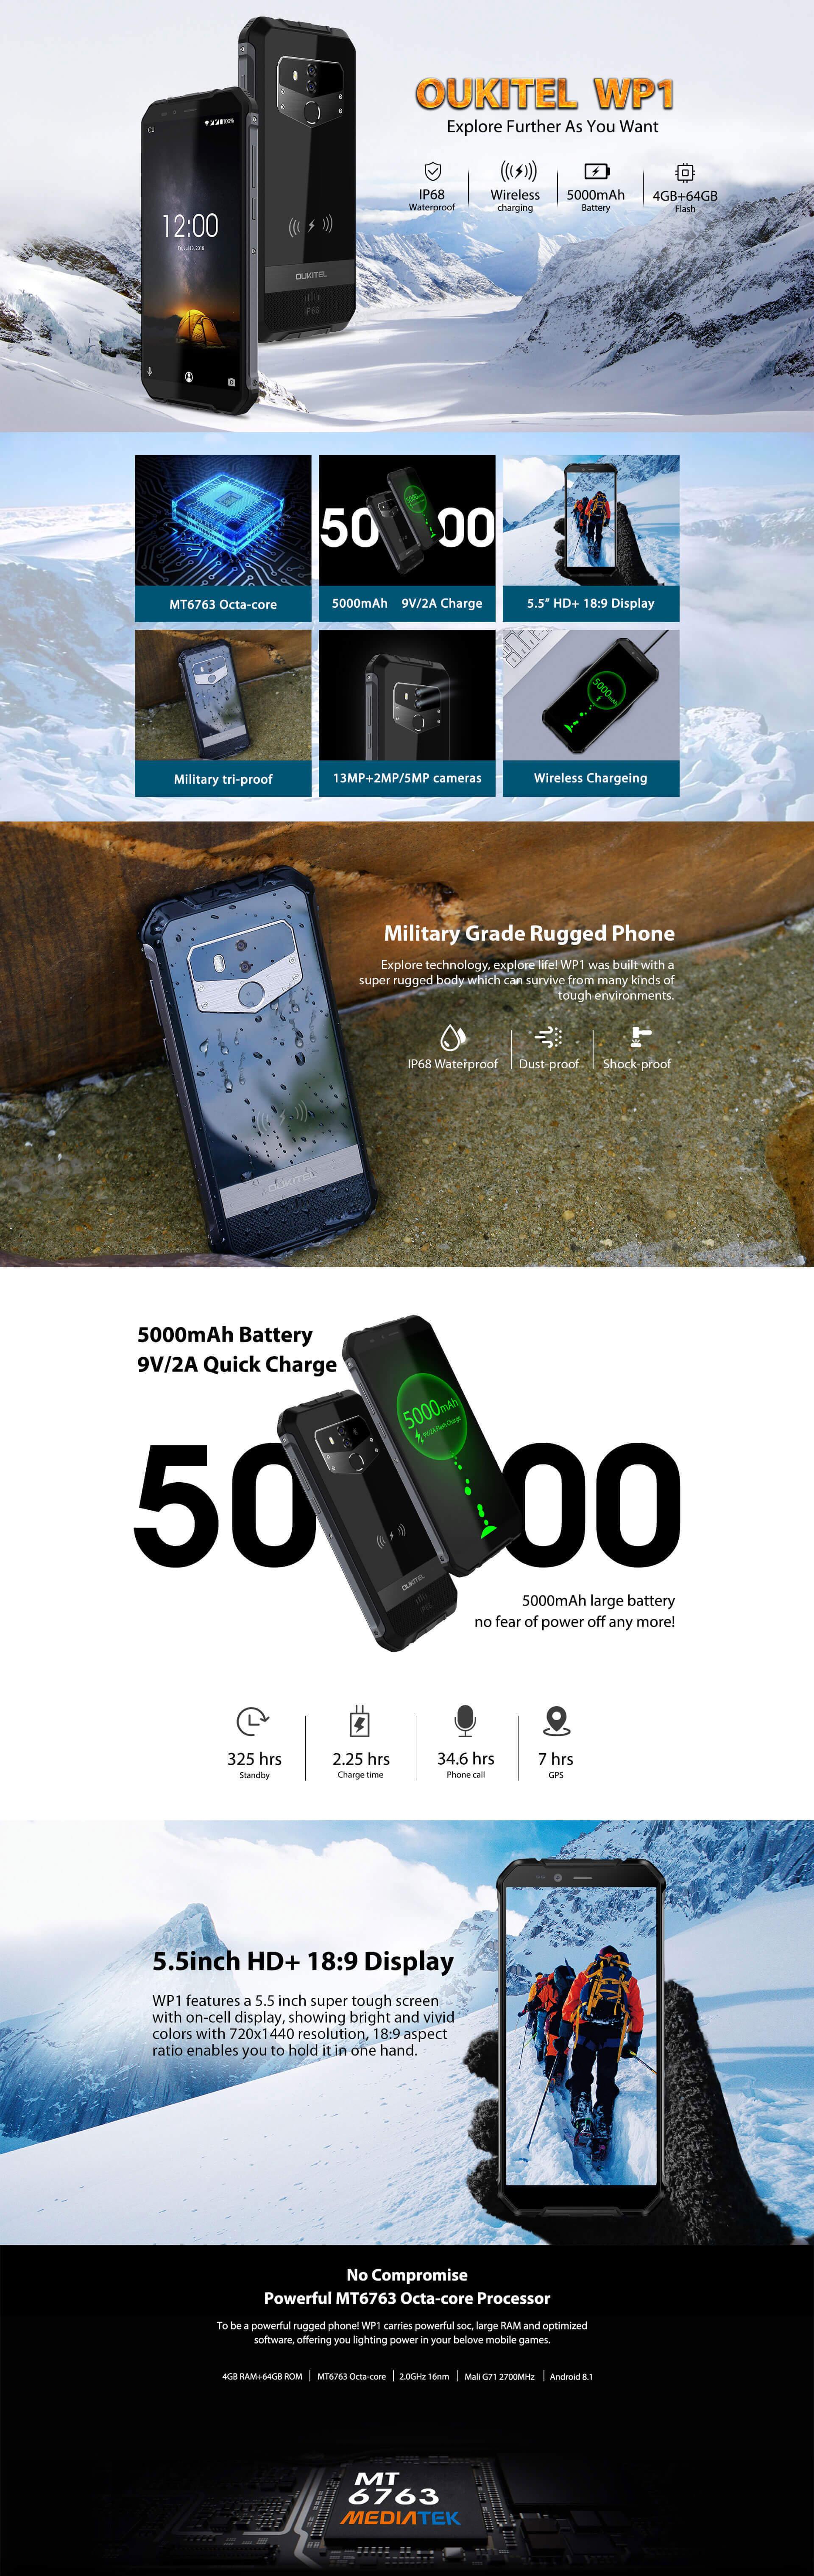 Acheter Oukitel WP1 pas cher